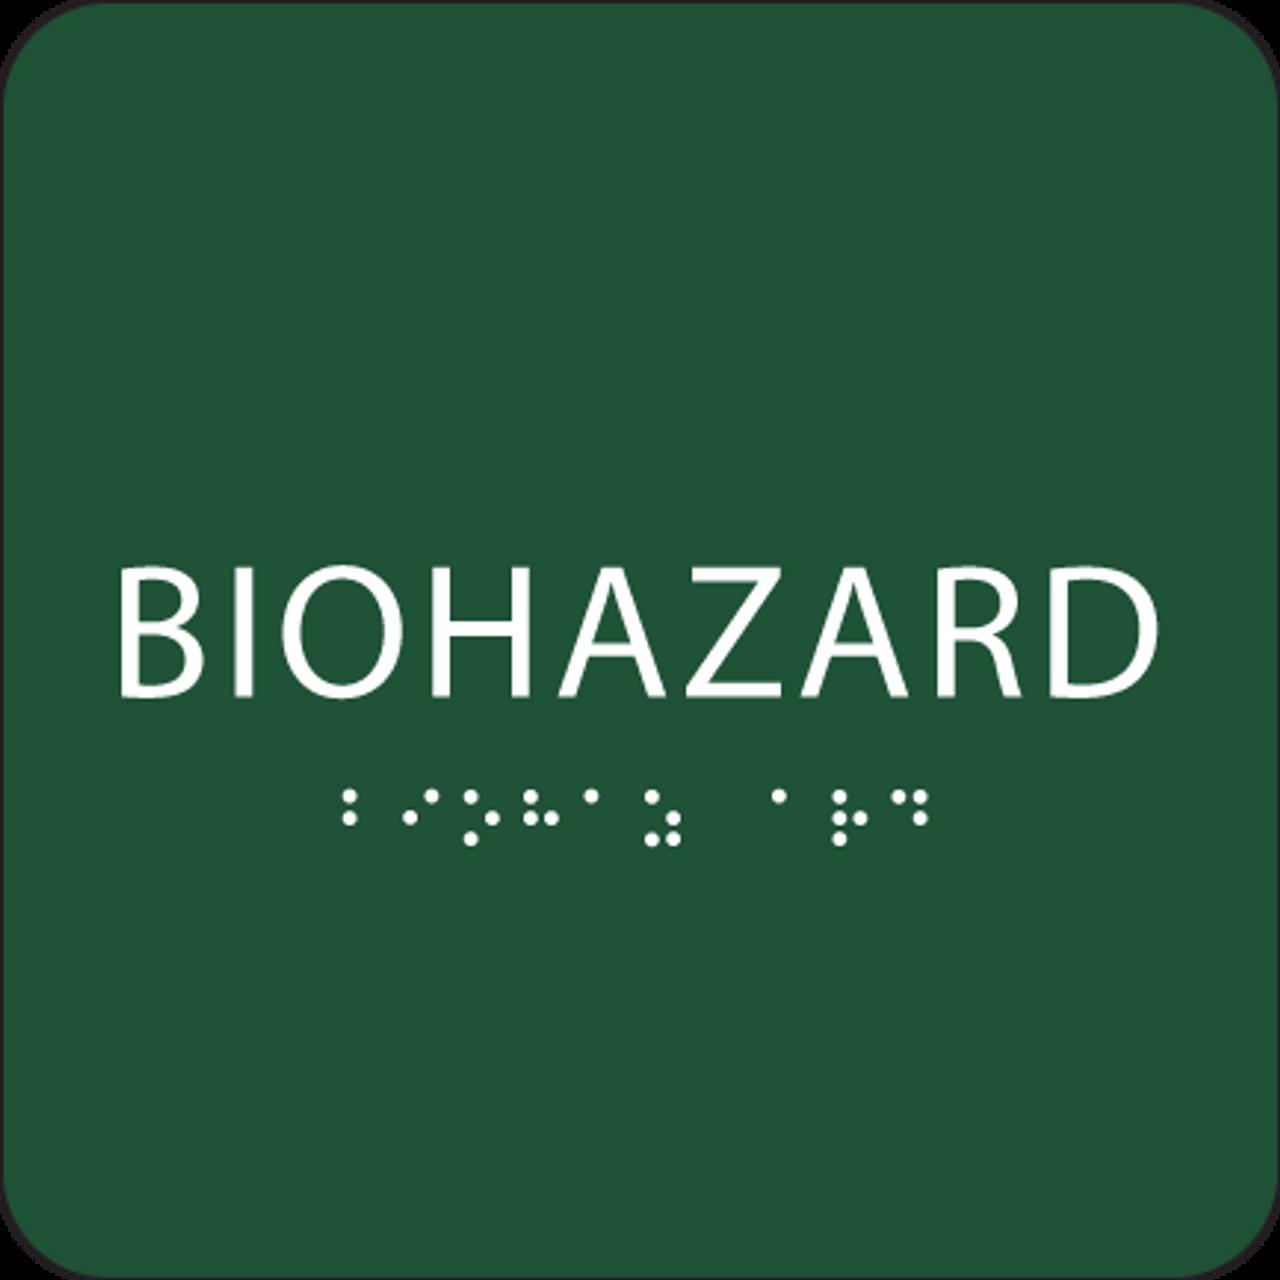 Green Biohazard ADA Sign